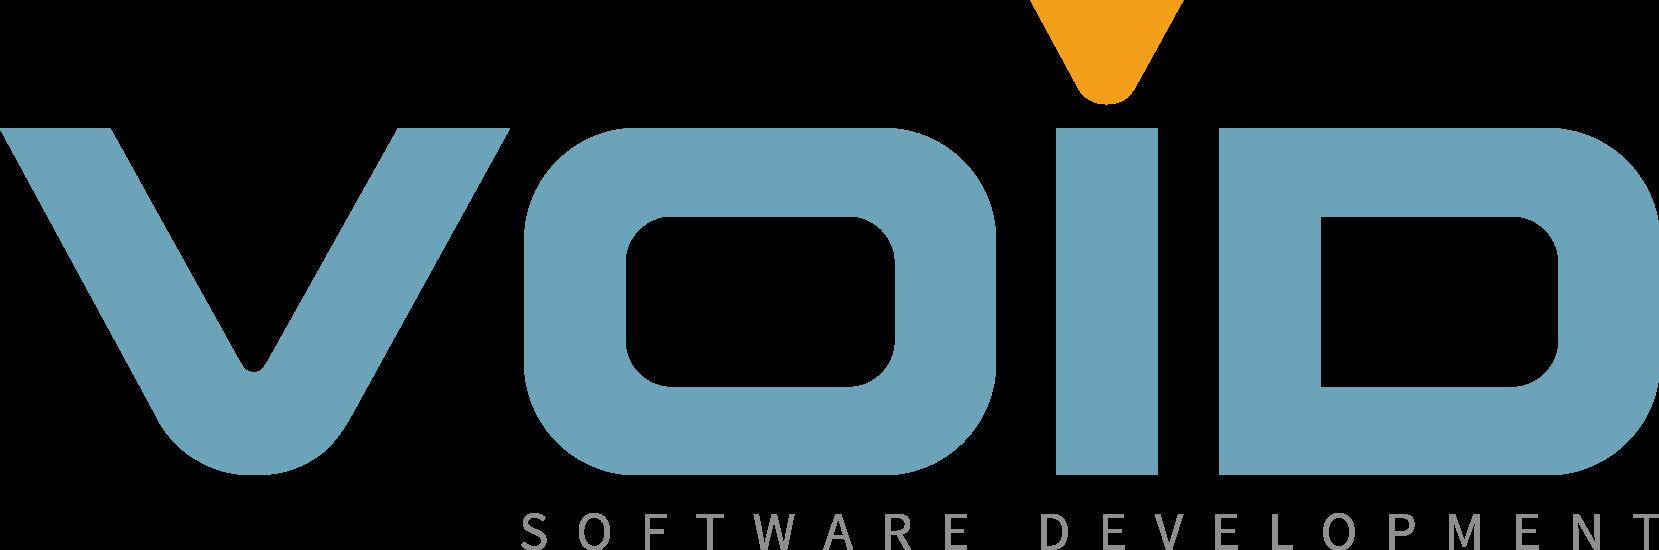 http://void.software/